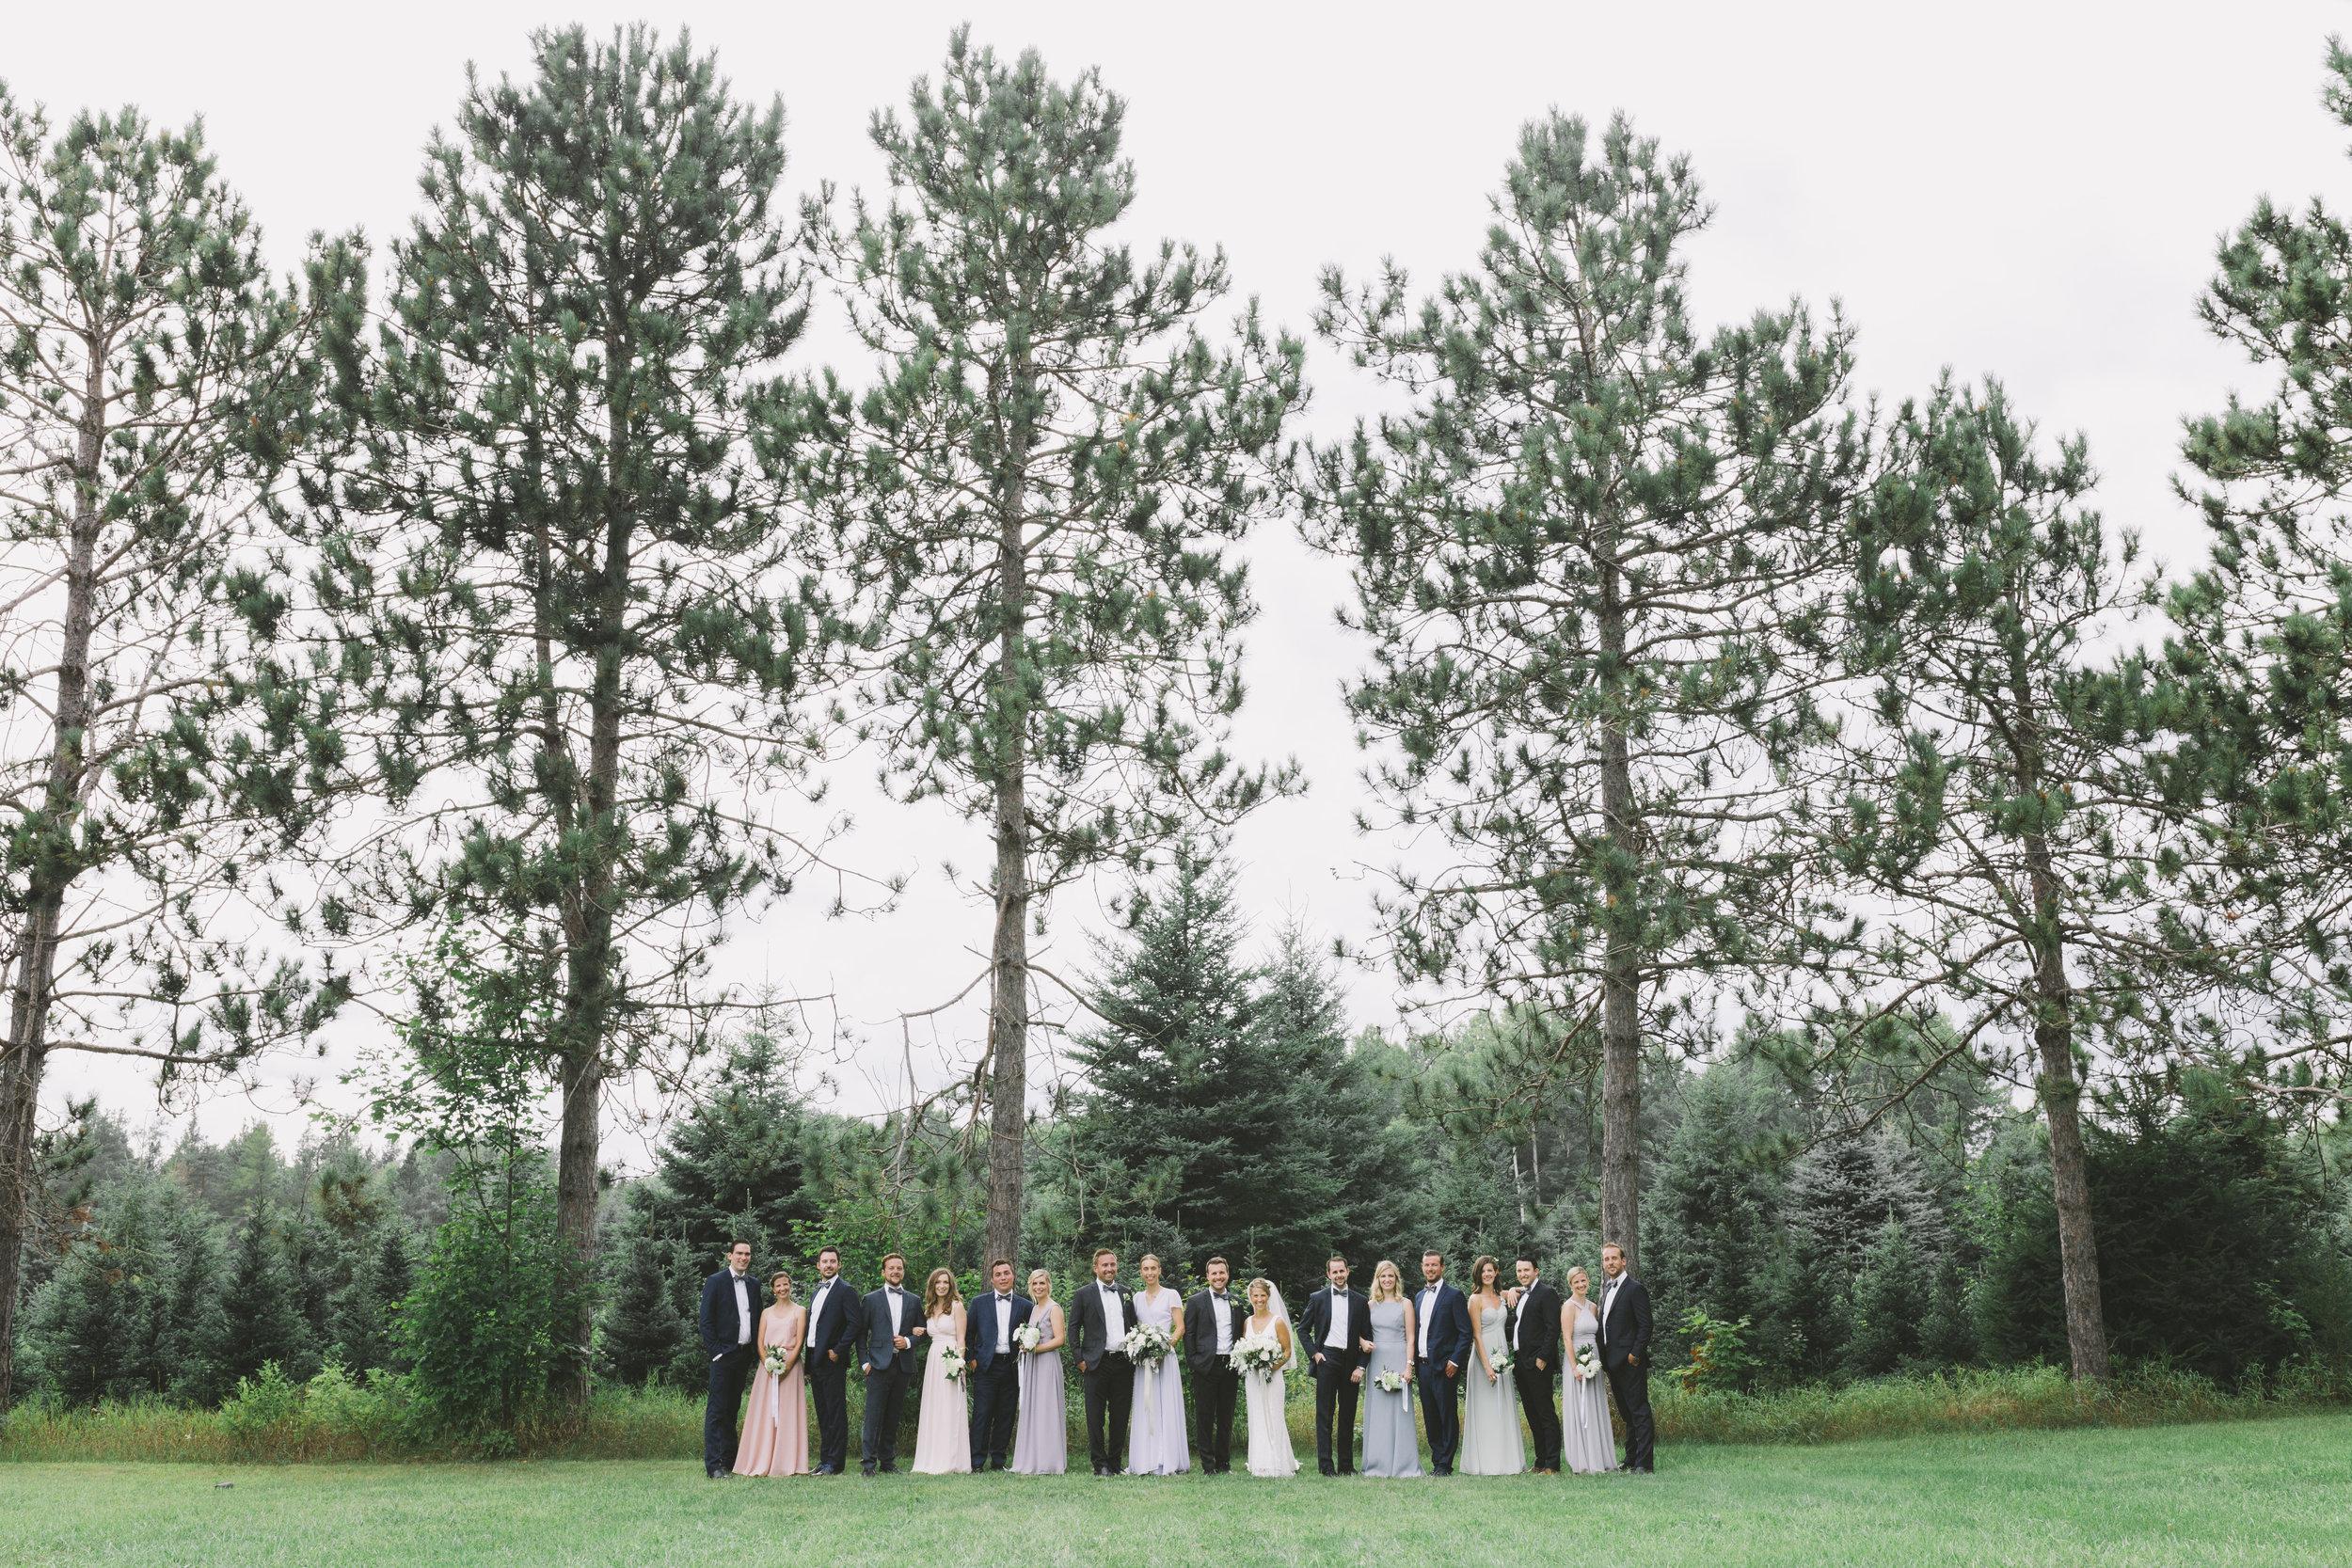 Wedding Party at Drysdale's Tree Farm